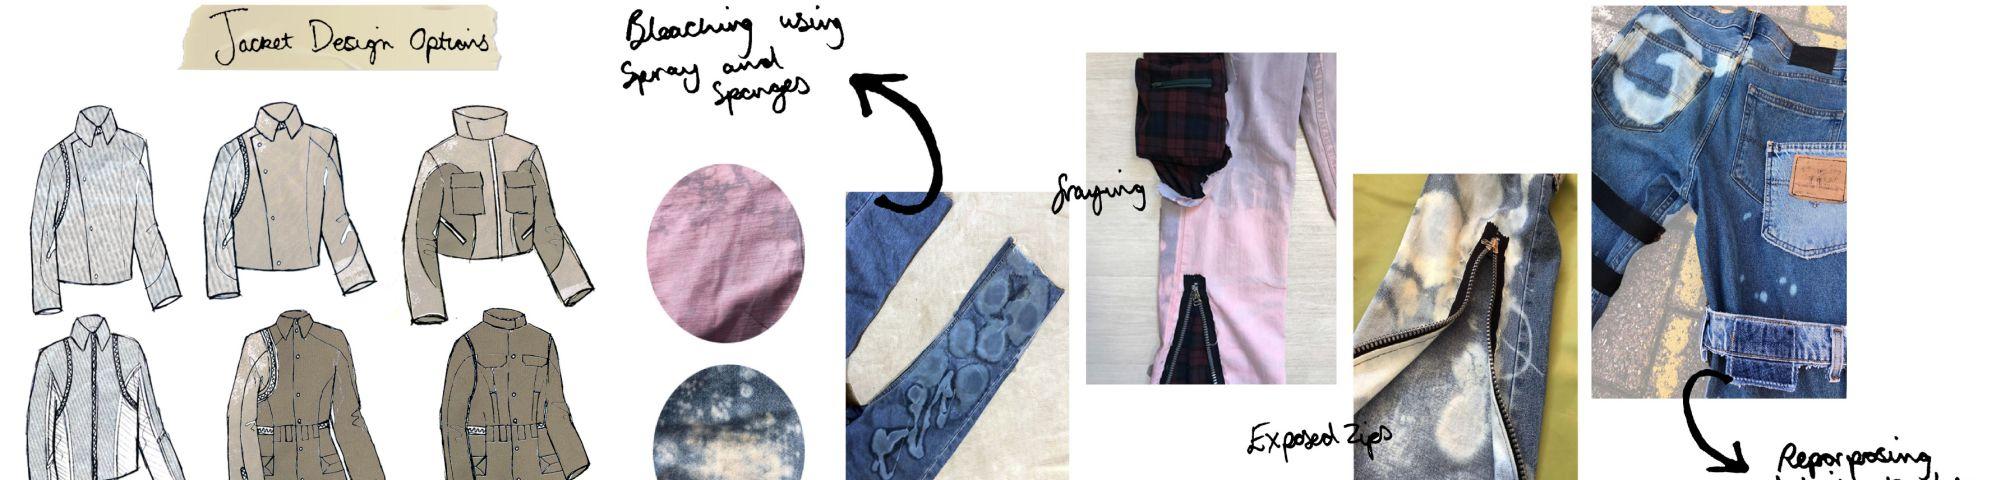 Fashion illustration with fabrics